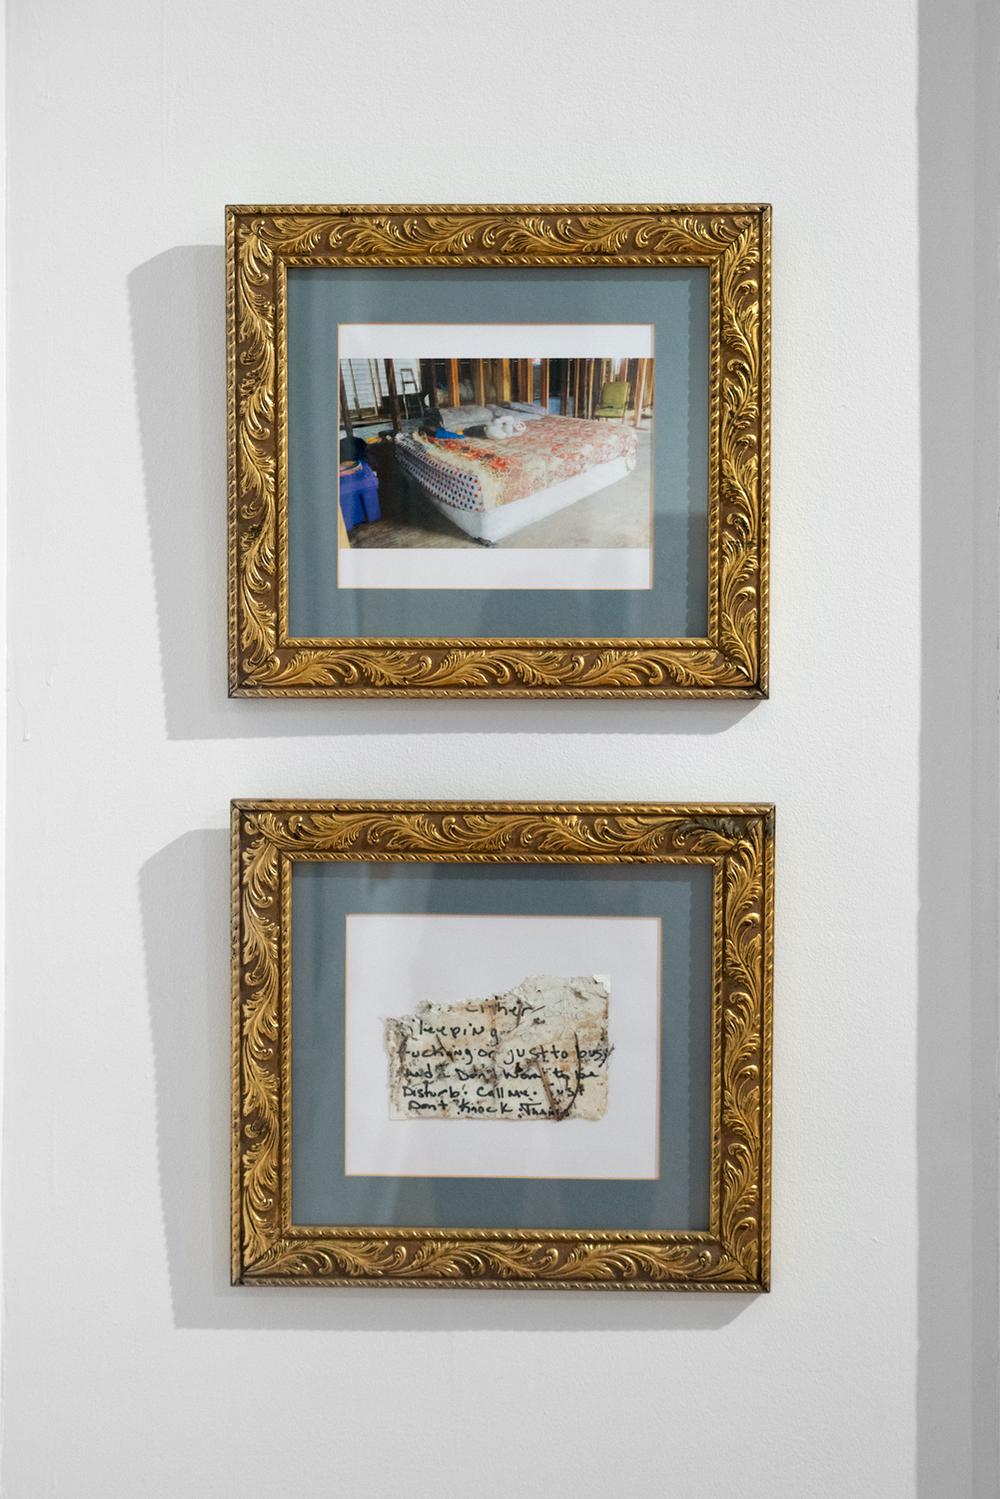 Heidi Hickman, House, 2016; Home, 2016. Framed digital prints.